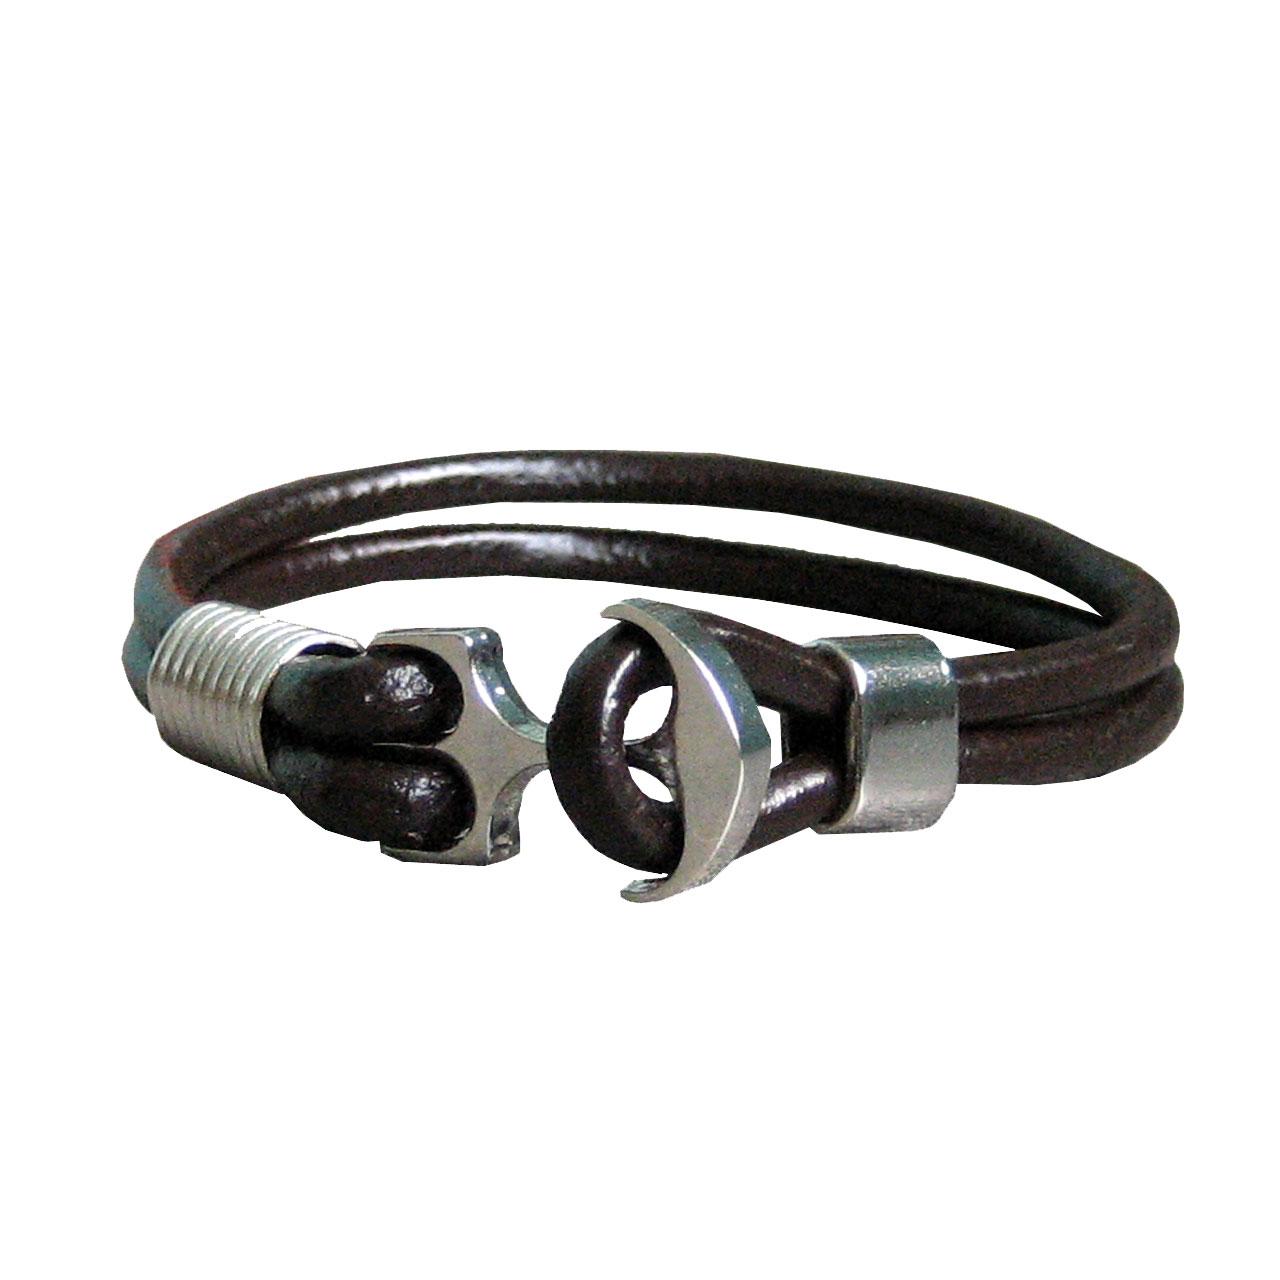 دستبند چرم  طبیعی دانوب طرح لنگر کد 002 سایز L